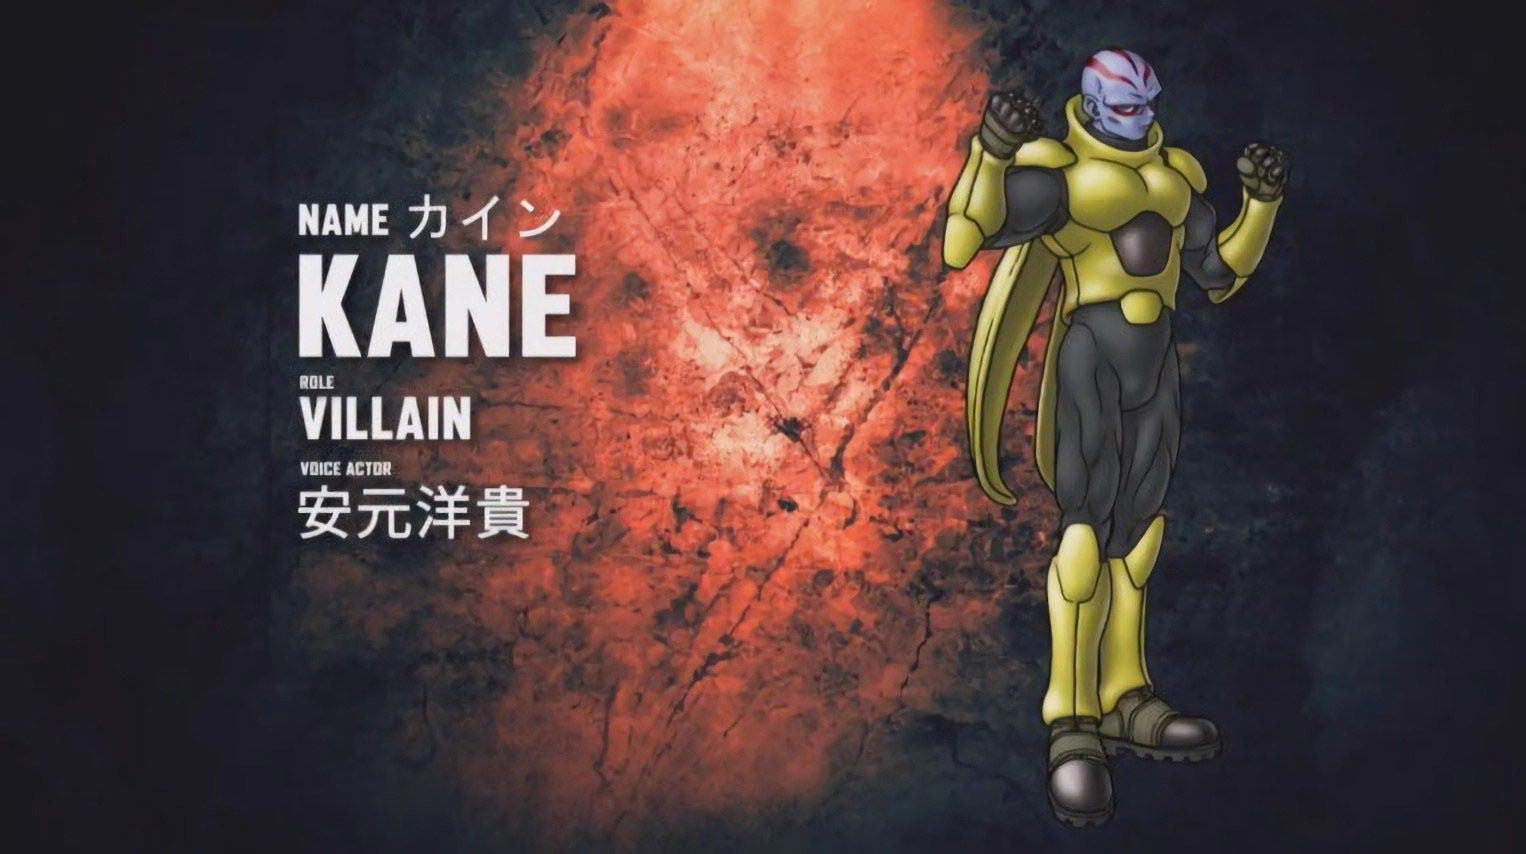 Primeras imágenes de Kane, personaje creado por Akira Toriyama para Jump Force 2